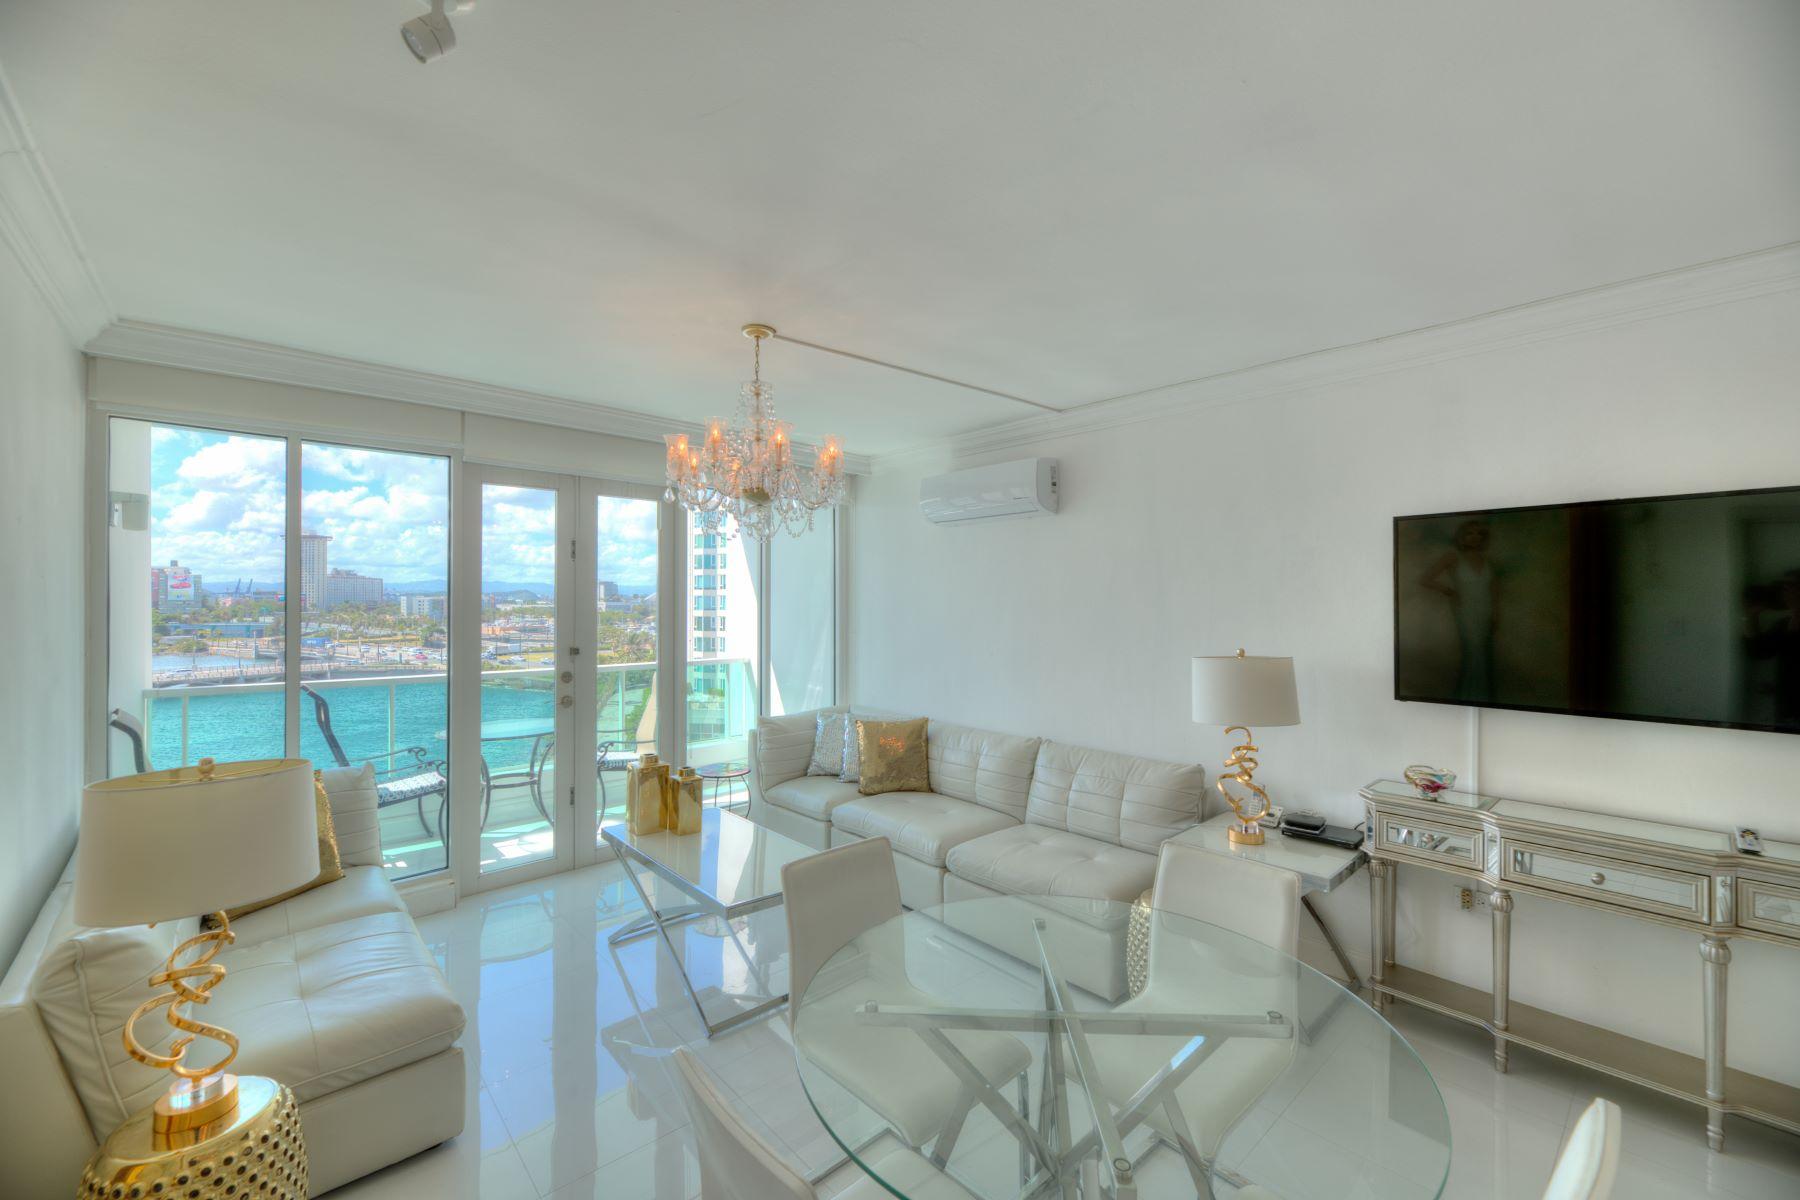 Apartments 용 임대 에 Oceanfront Two Bedroom Villa 1 Los Rosales St. Apt. 7725, 7726 & 7727 San Juan, Puerto Rico 00901 푸에르토리코